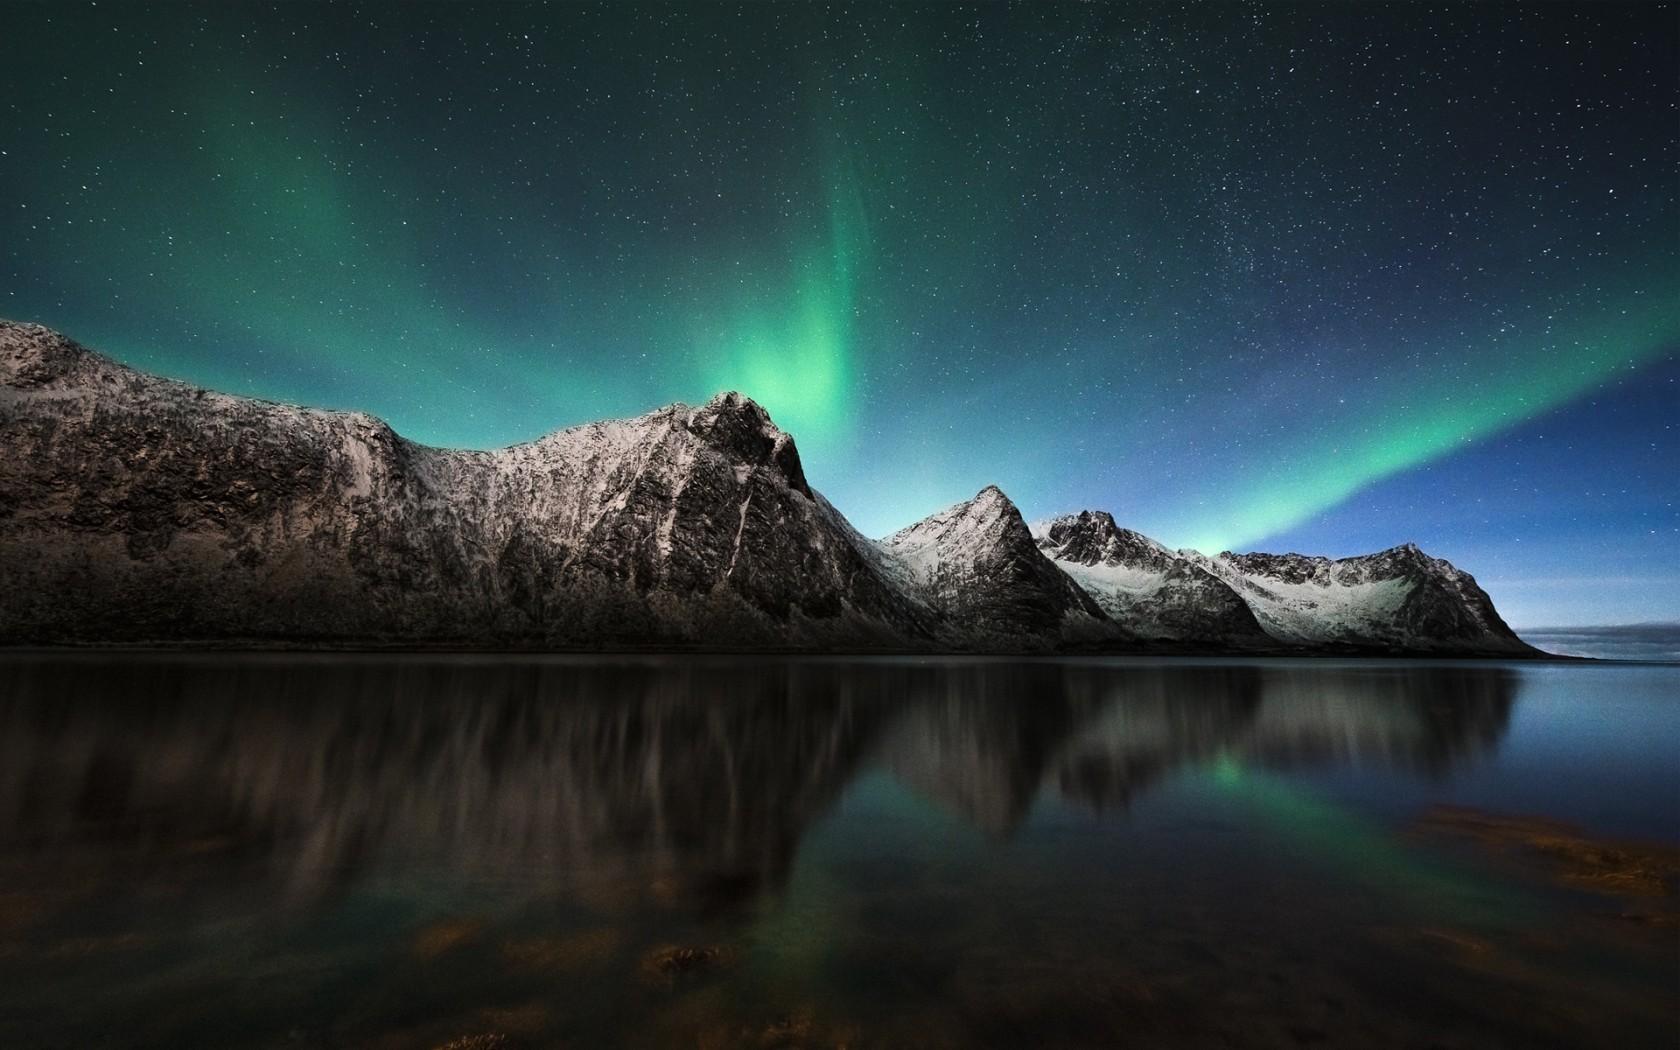 Iphone 4 Winter Wallpaper Aurora Borealis Northern Lights Iceland Wallpapers Hd